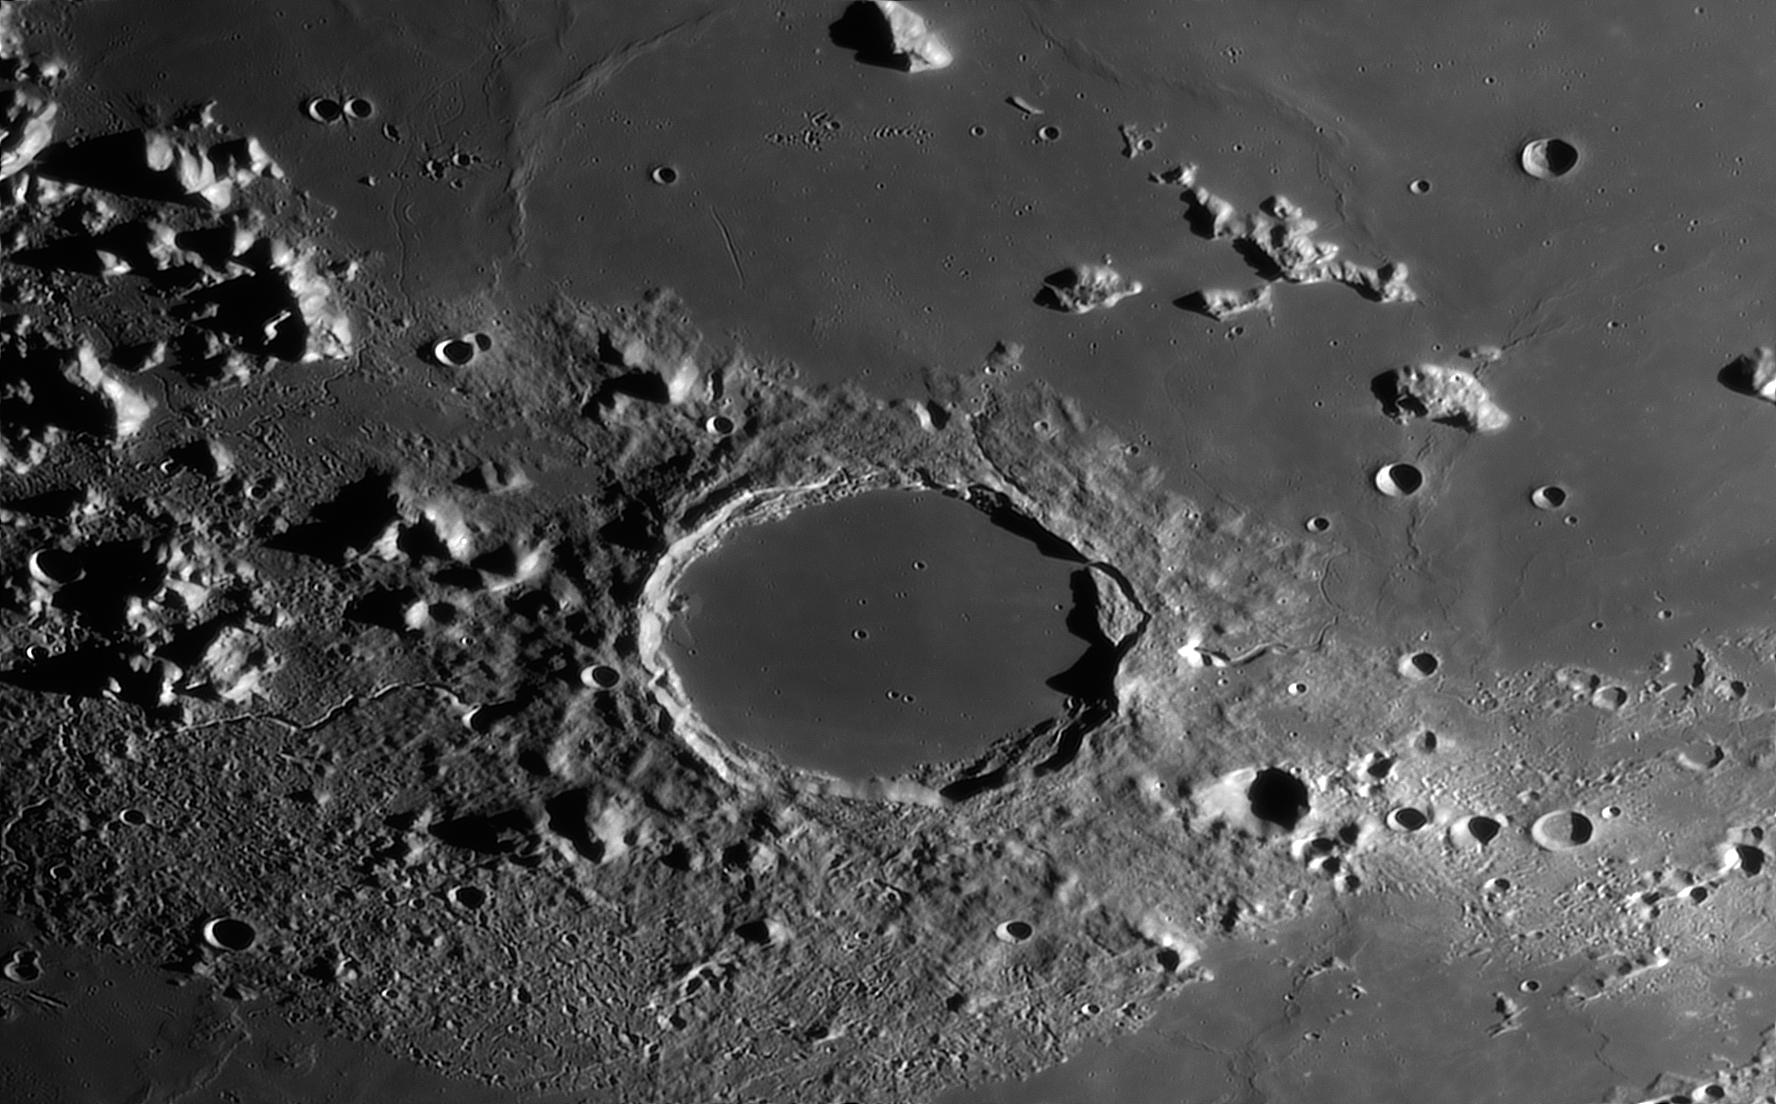 Platon-21Sept2019-3h28minUT-C14-F30-B192